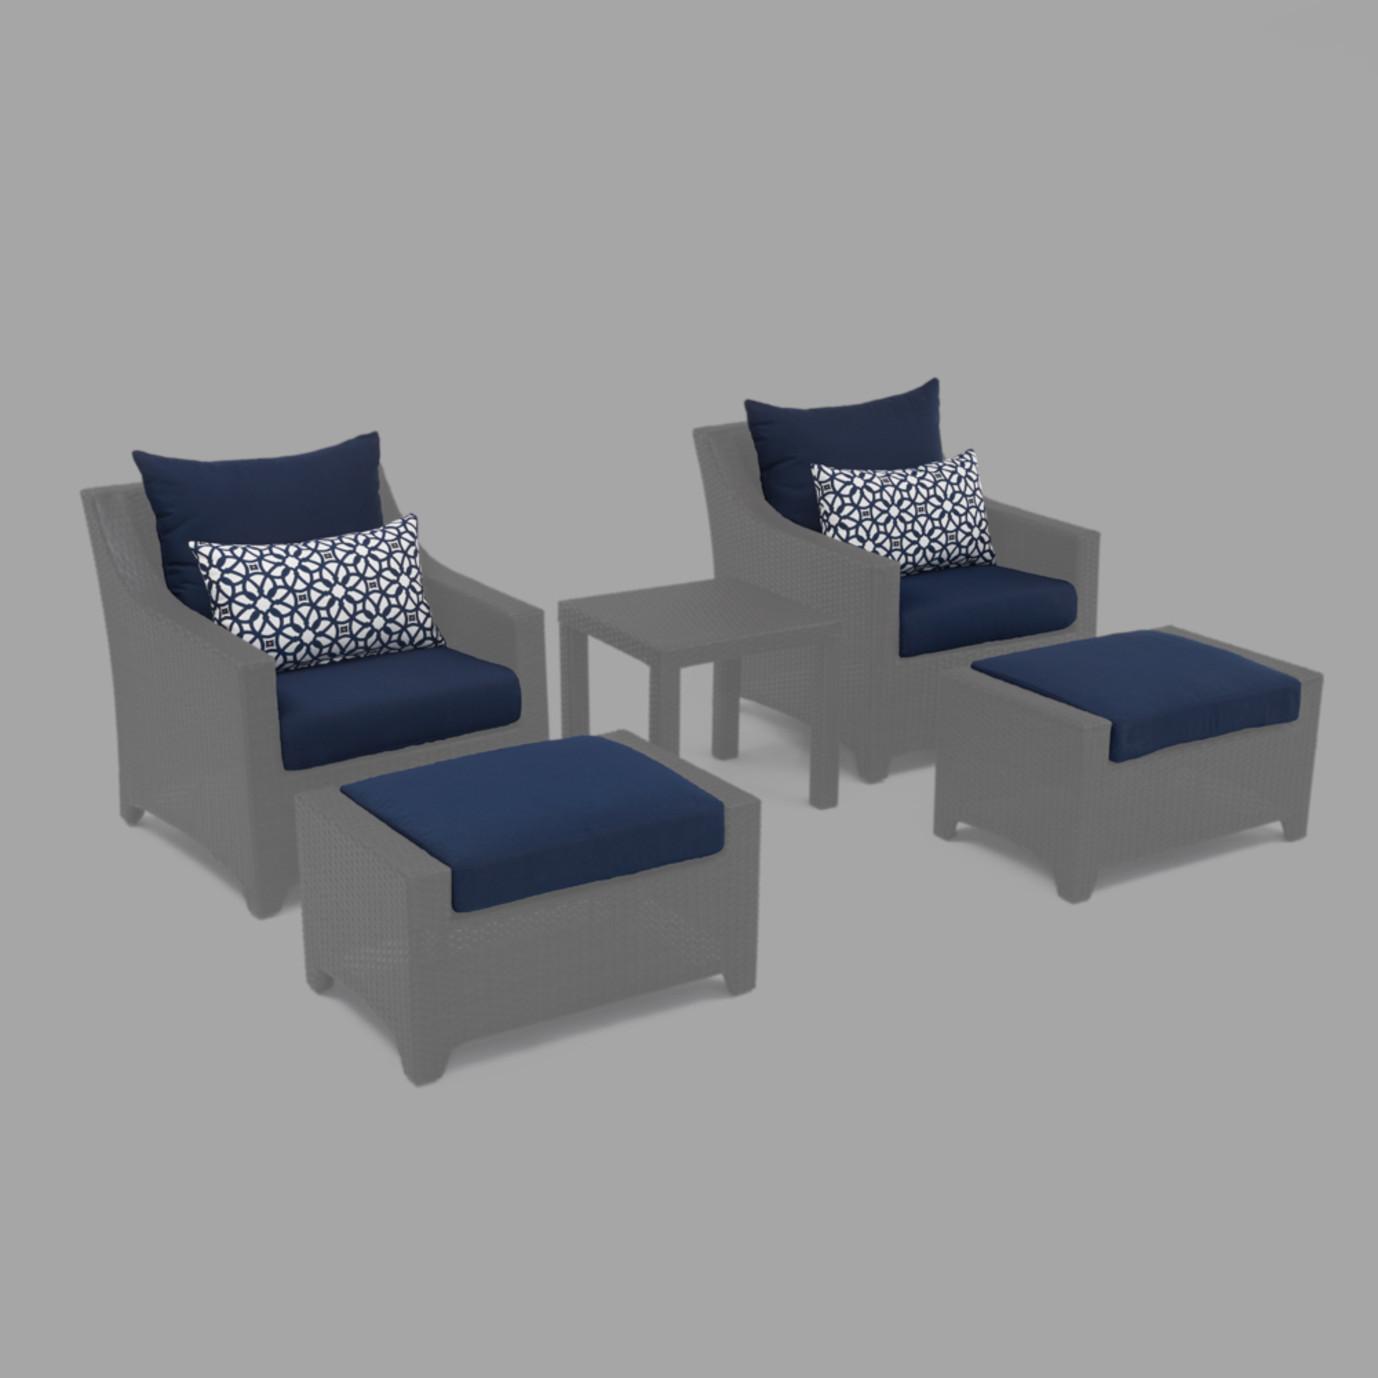 Modular Outdoor 5pc Club Cushion Cover Set - Navy Blue